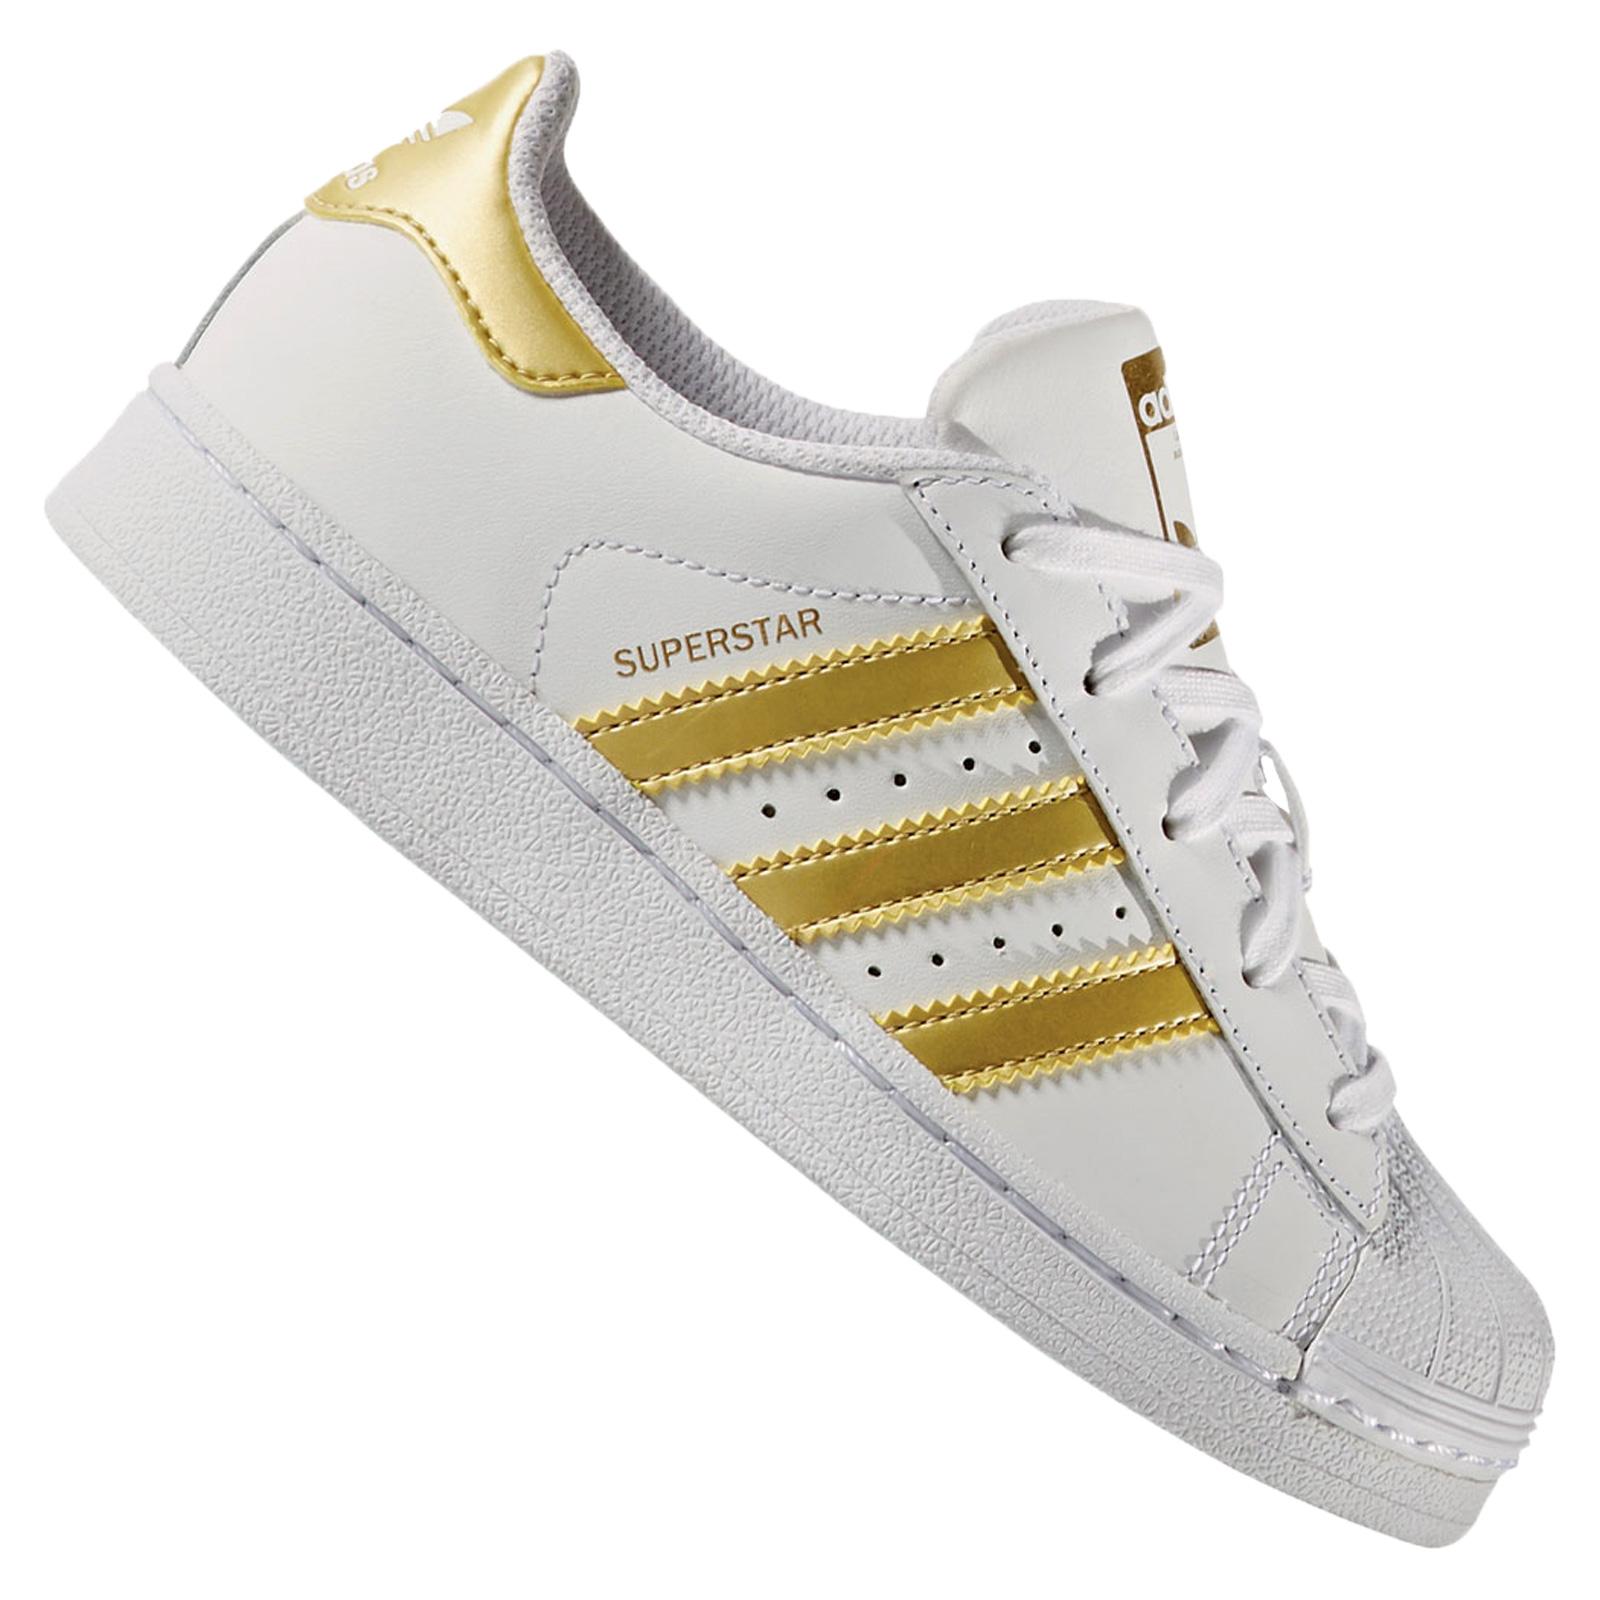 Girls Sneakers Originals Gold Adidas Children's Superstar About Ba8383 Details White Shoes wP08nOk